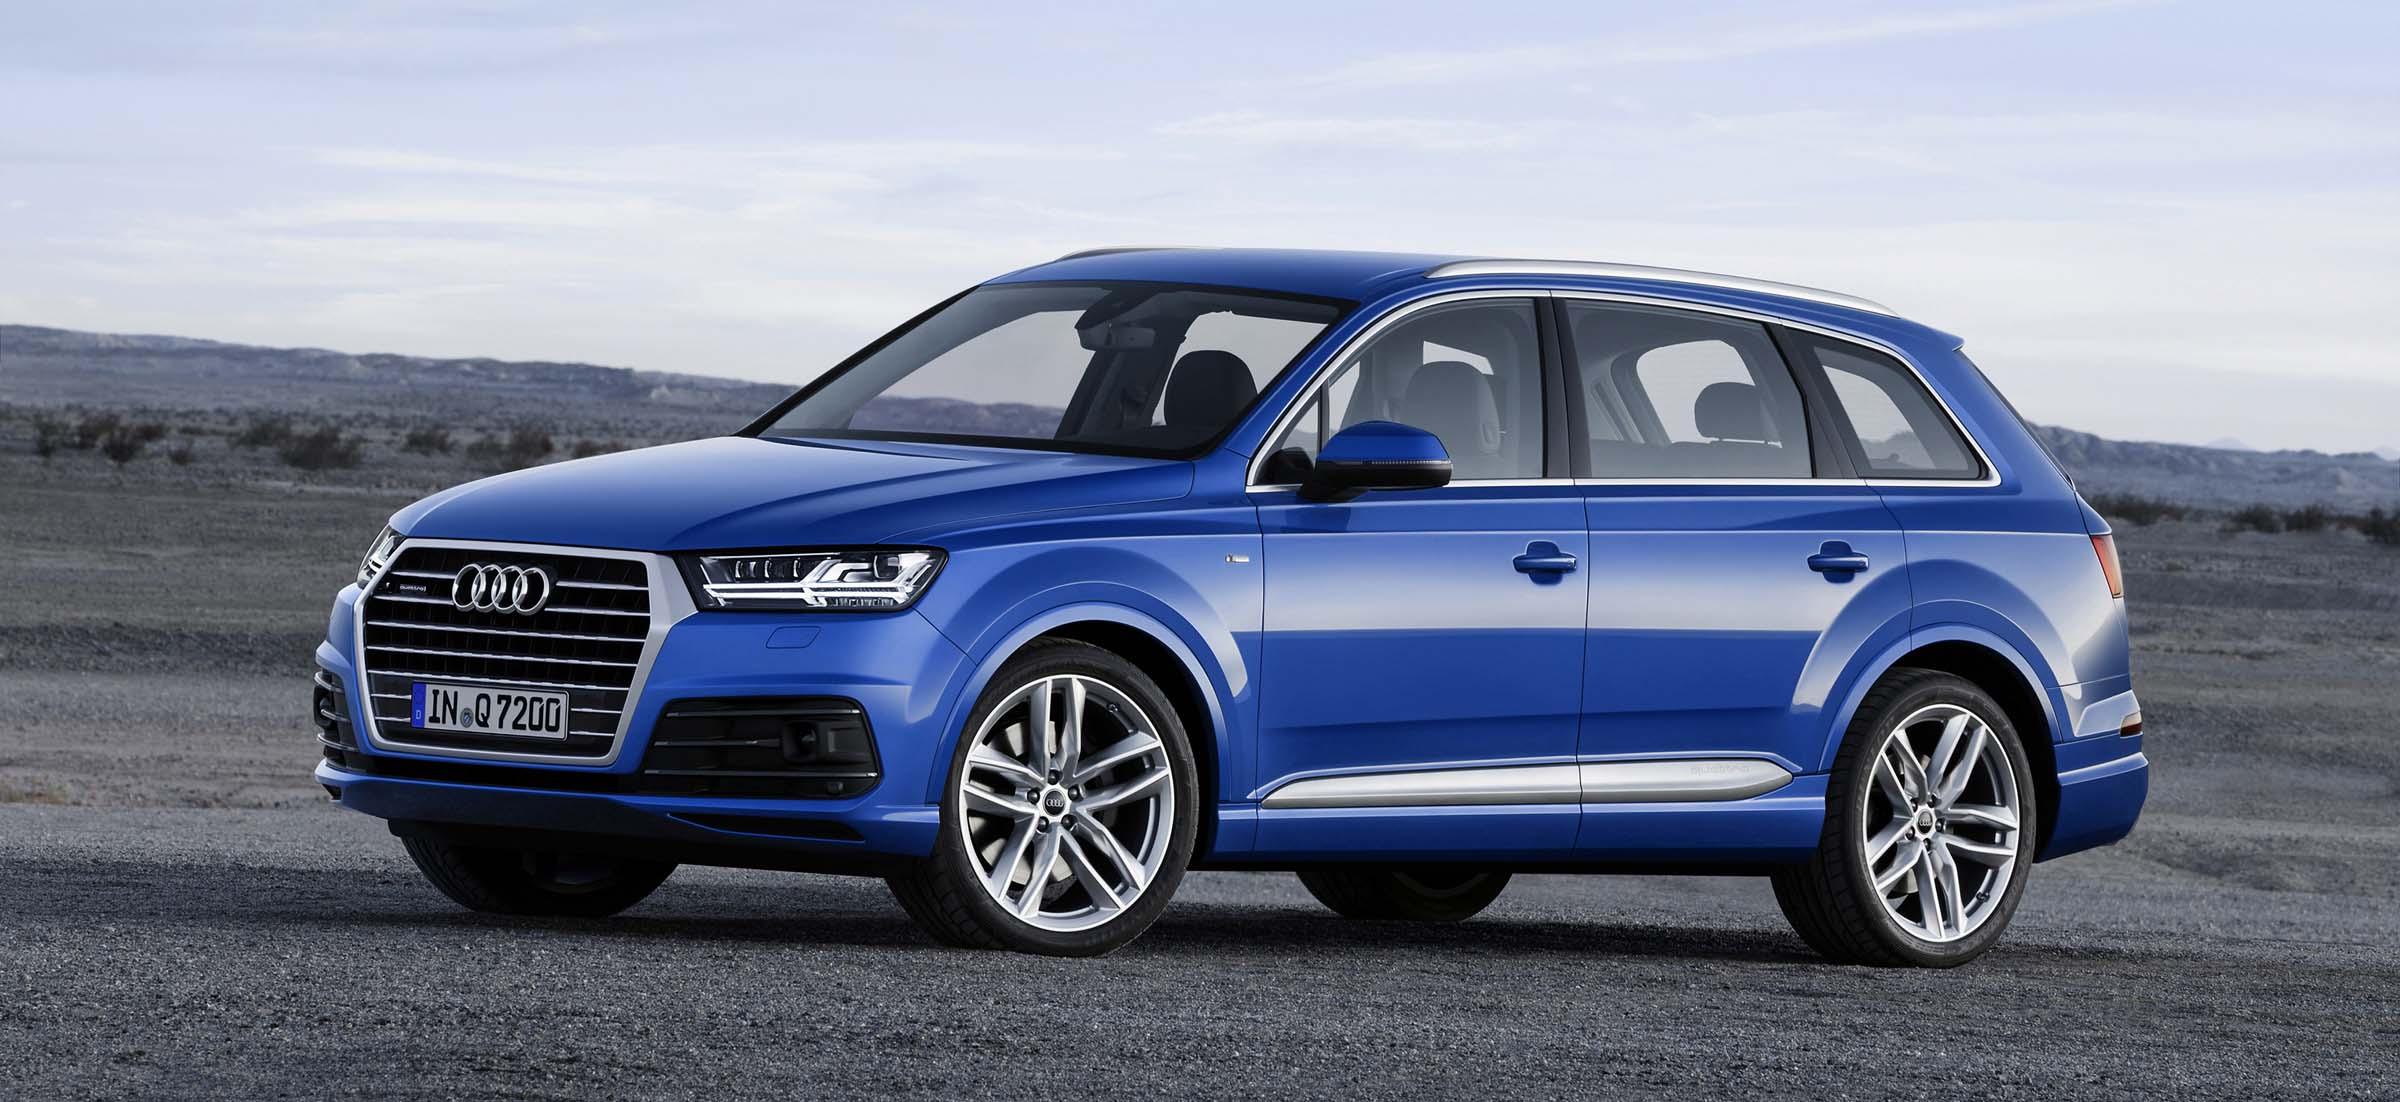 Novi Audi Q7 TDI troši samo 5,5 litara